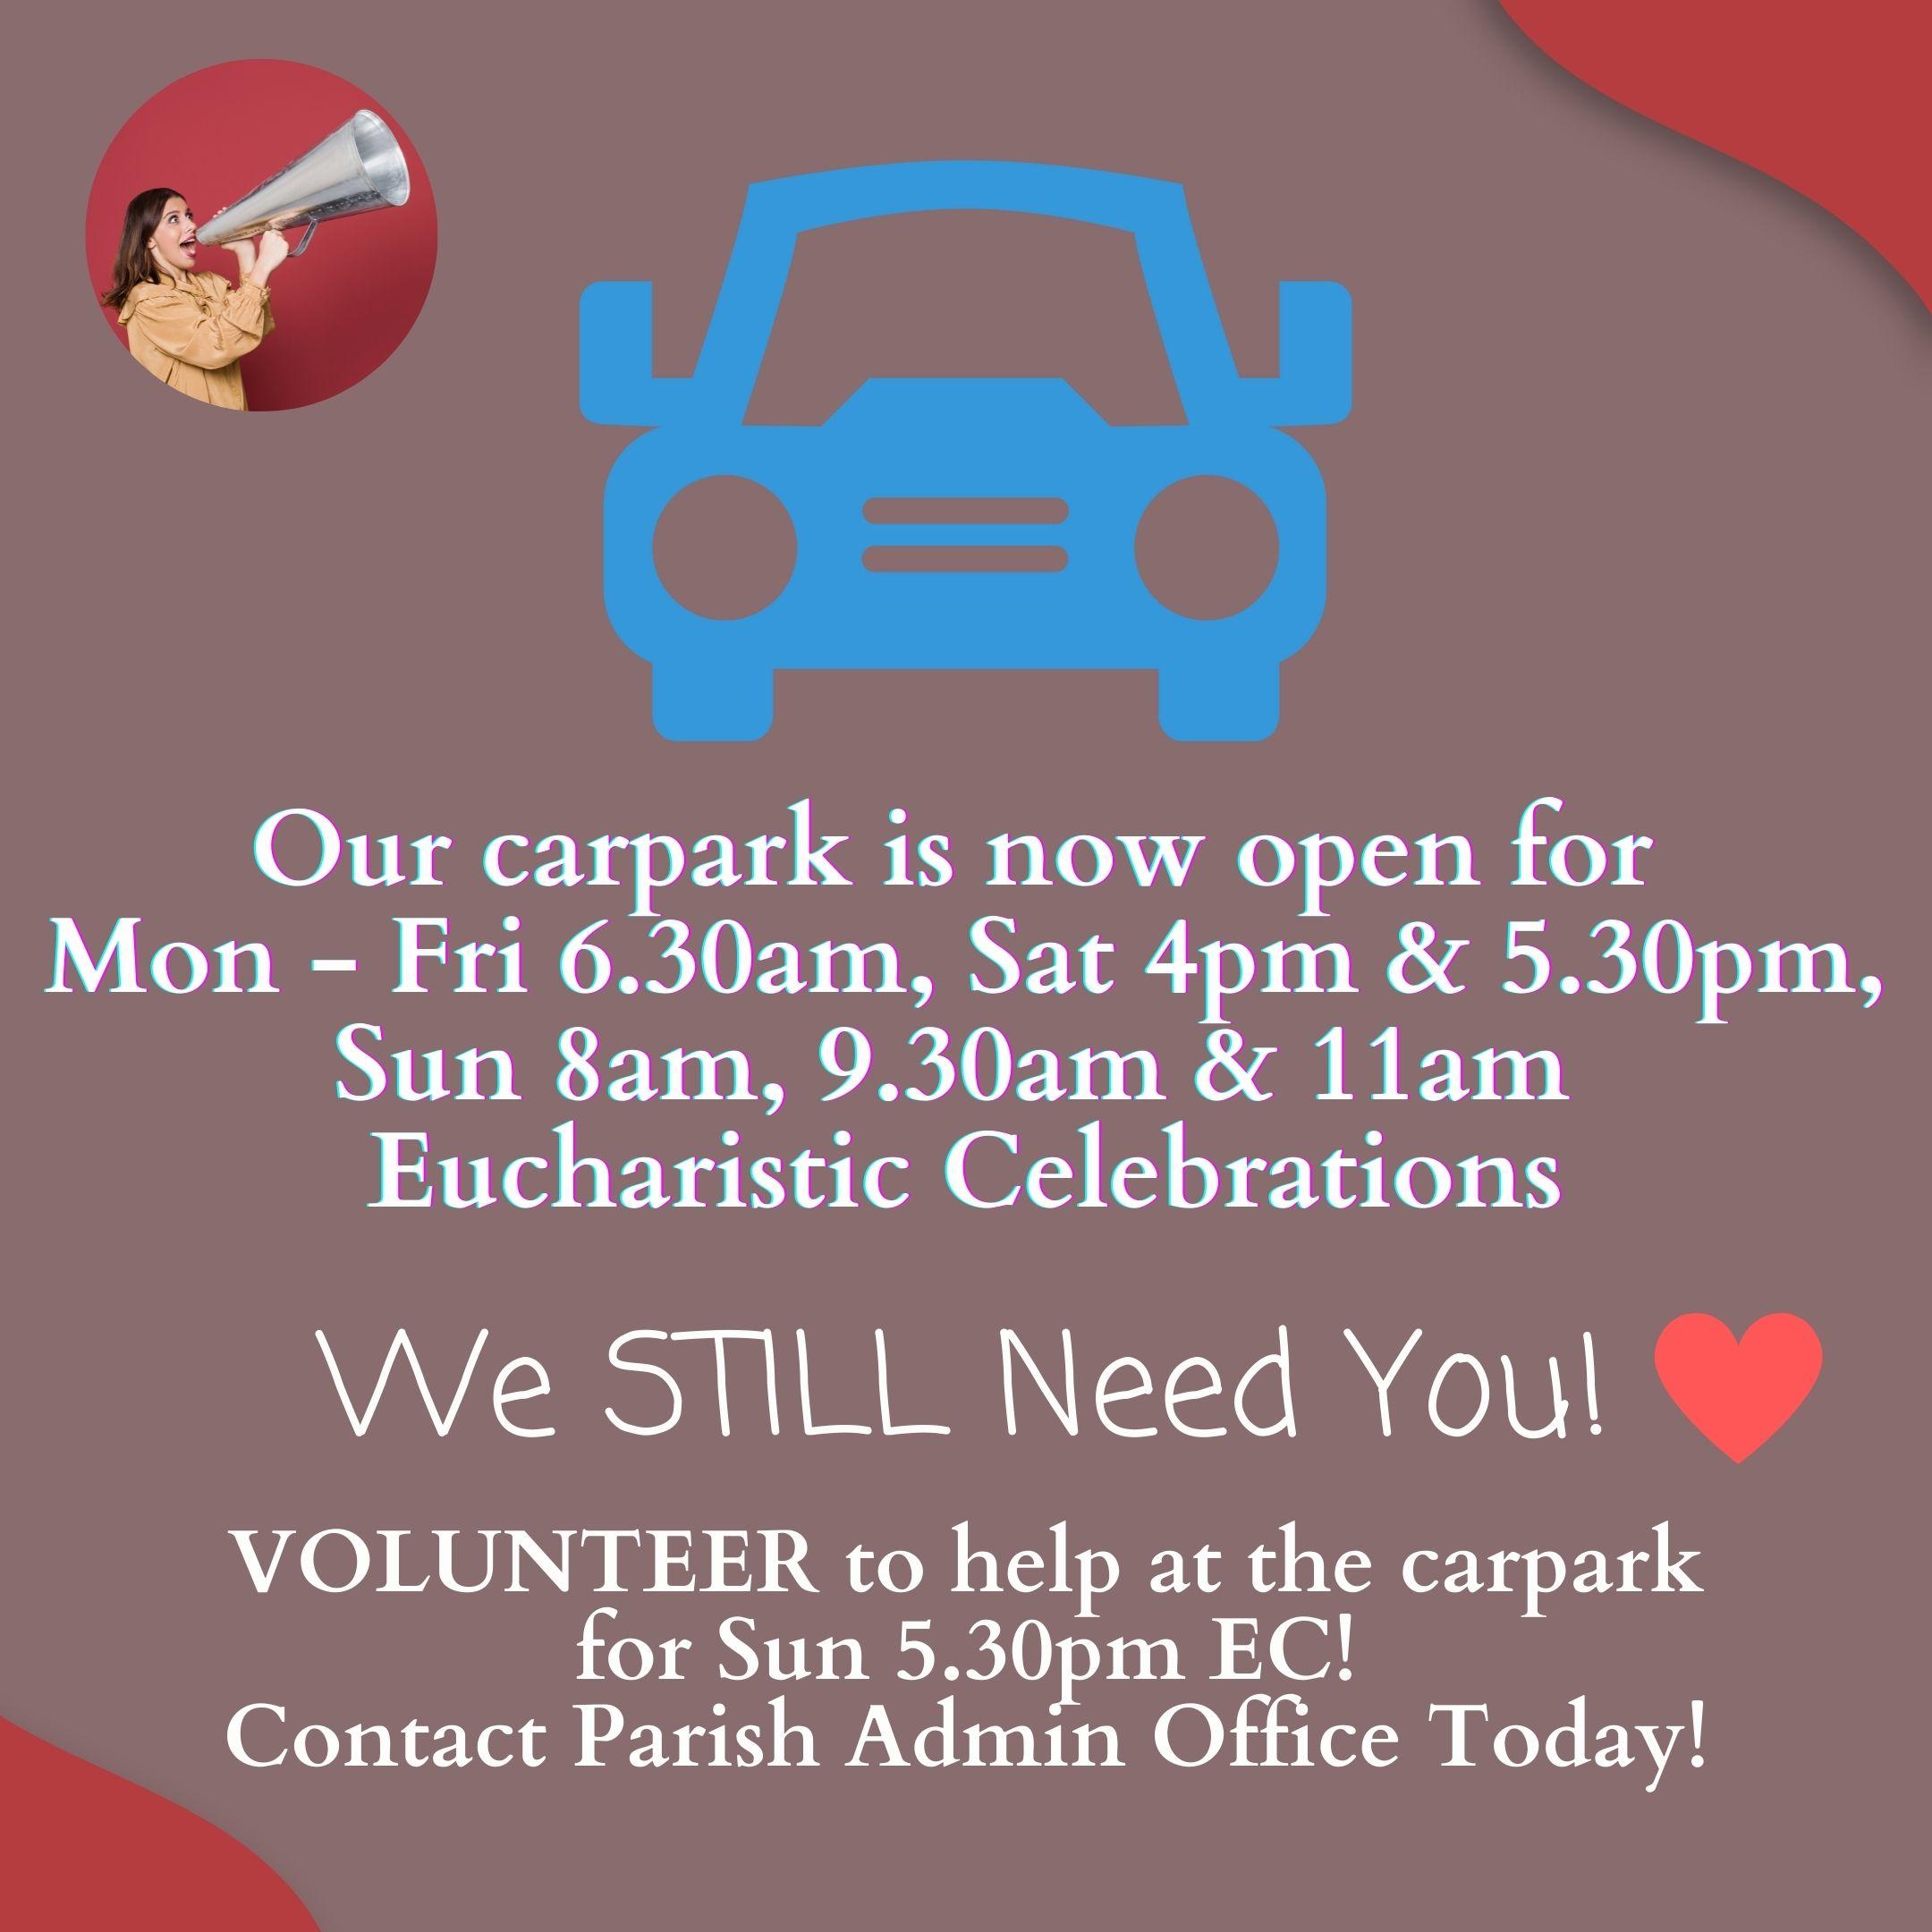 Church Carpark is Open at more ECs